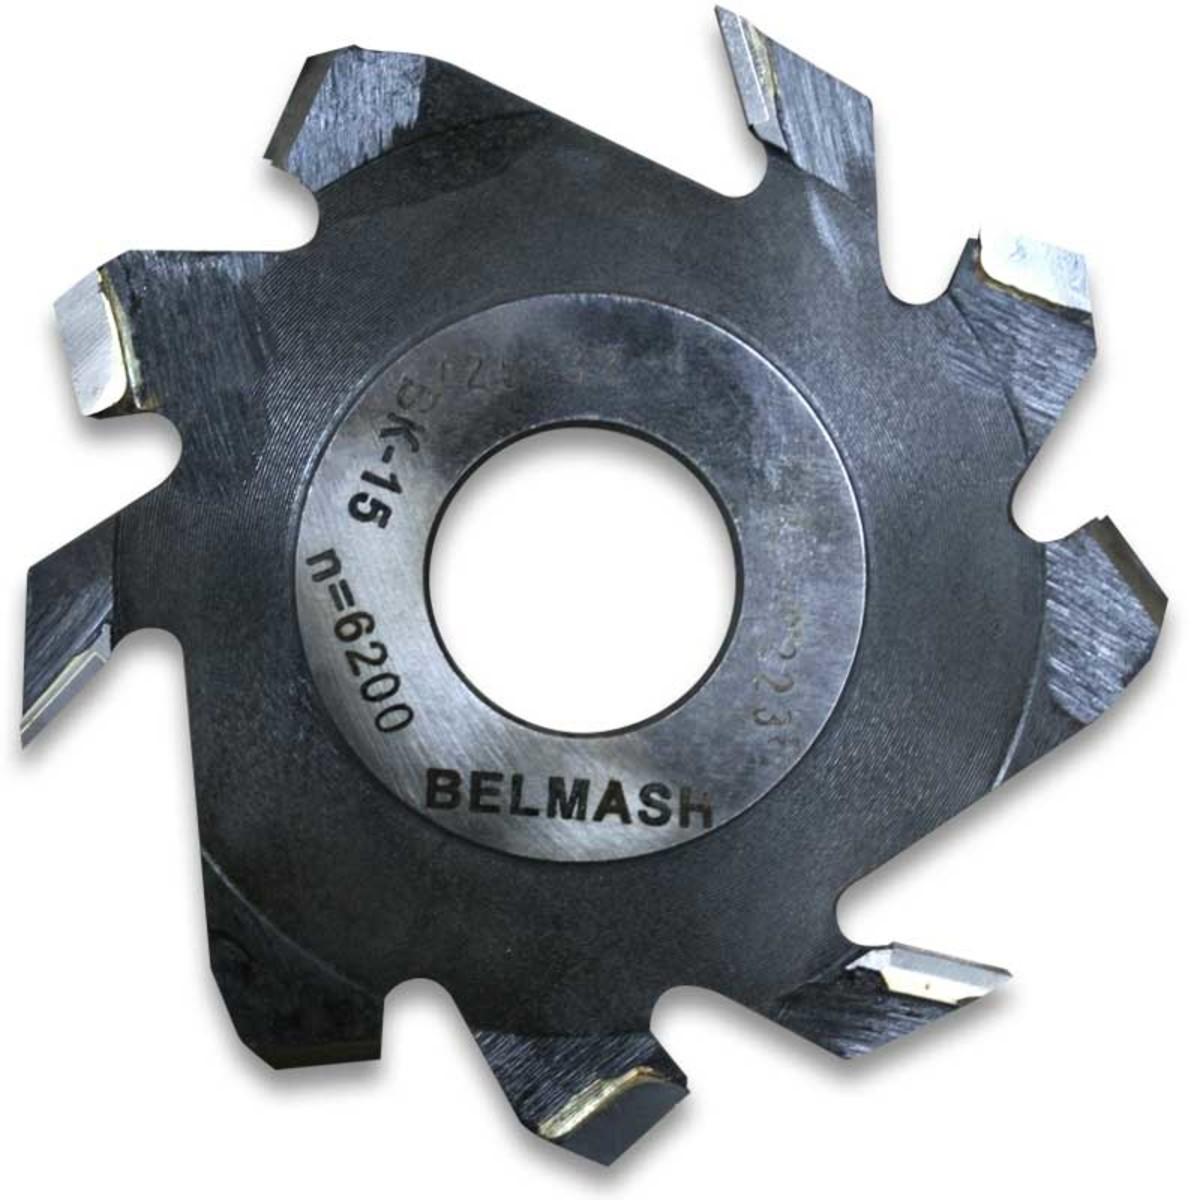 Фреза дисковая пазовая по дереву BELMASH 125x32x4 мм с подрезающими зубьями 9 зубьев